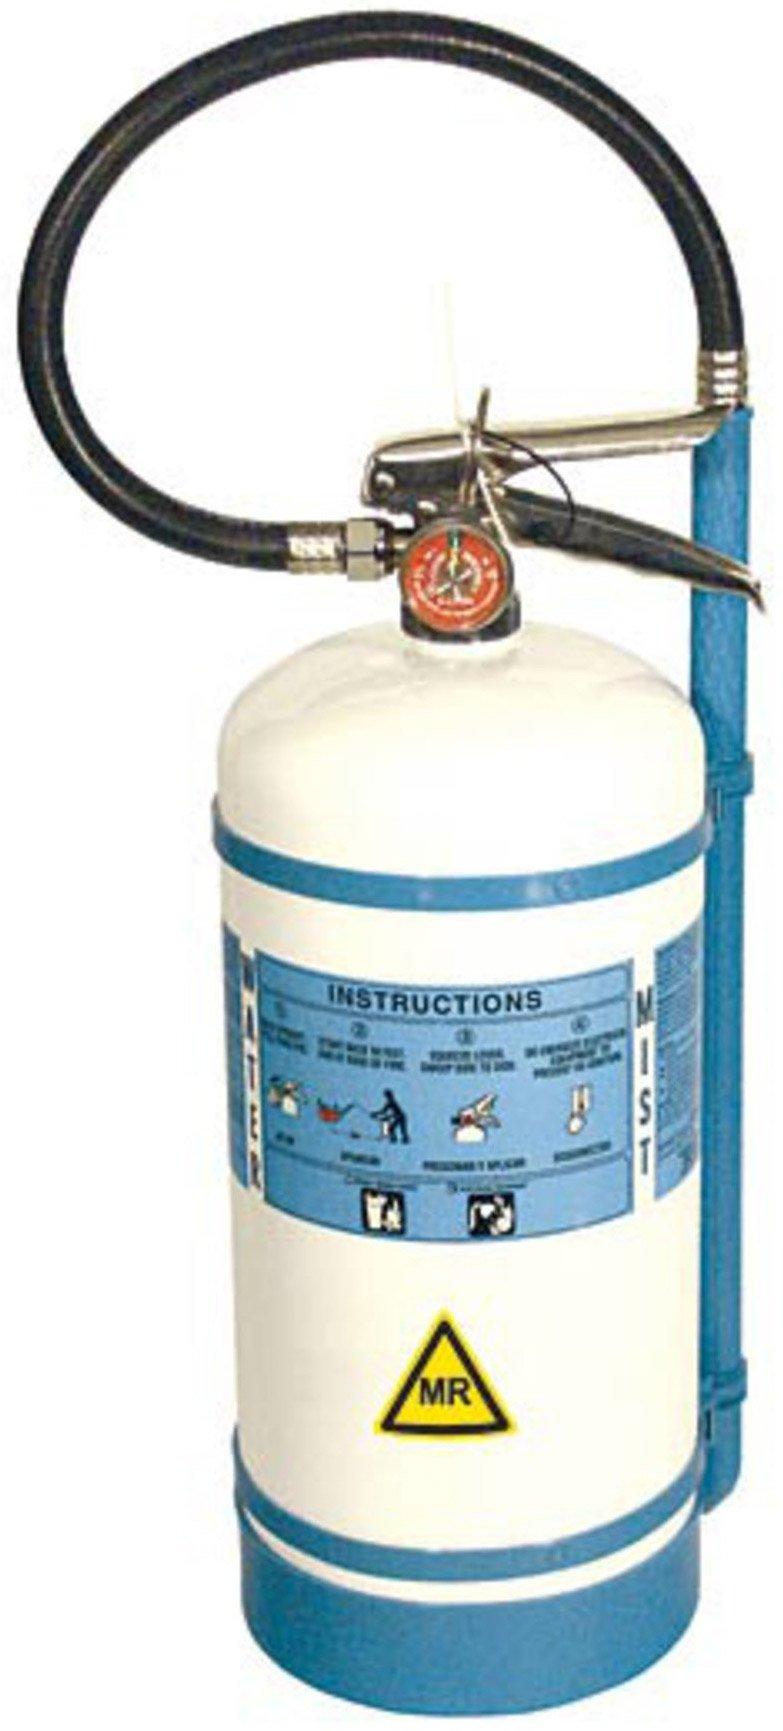 MRI-Certified Fire Extinguisher 1 3/4 Gallon